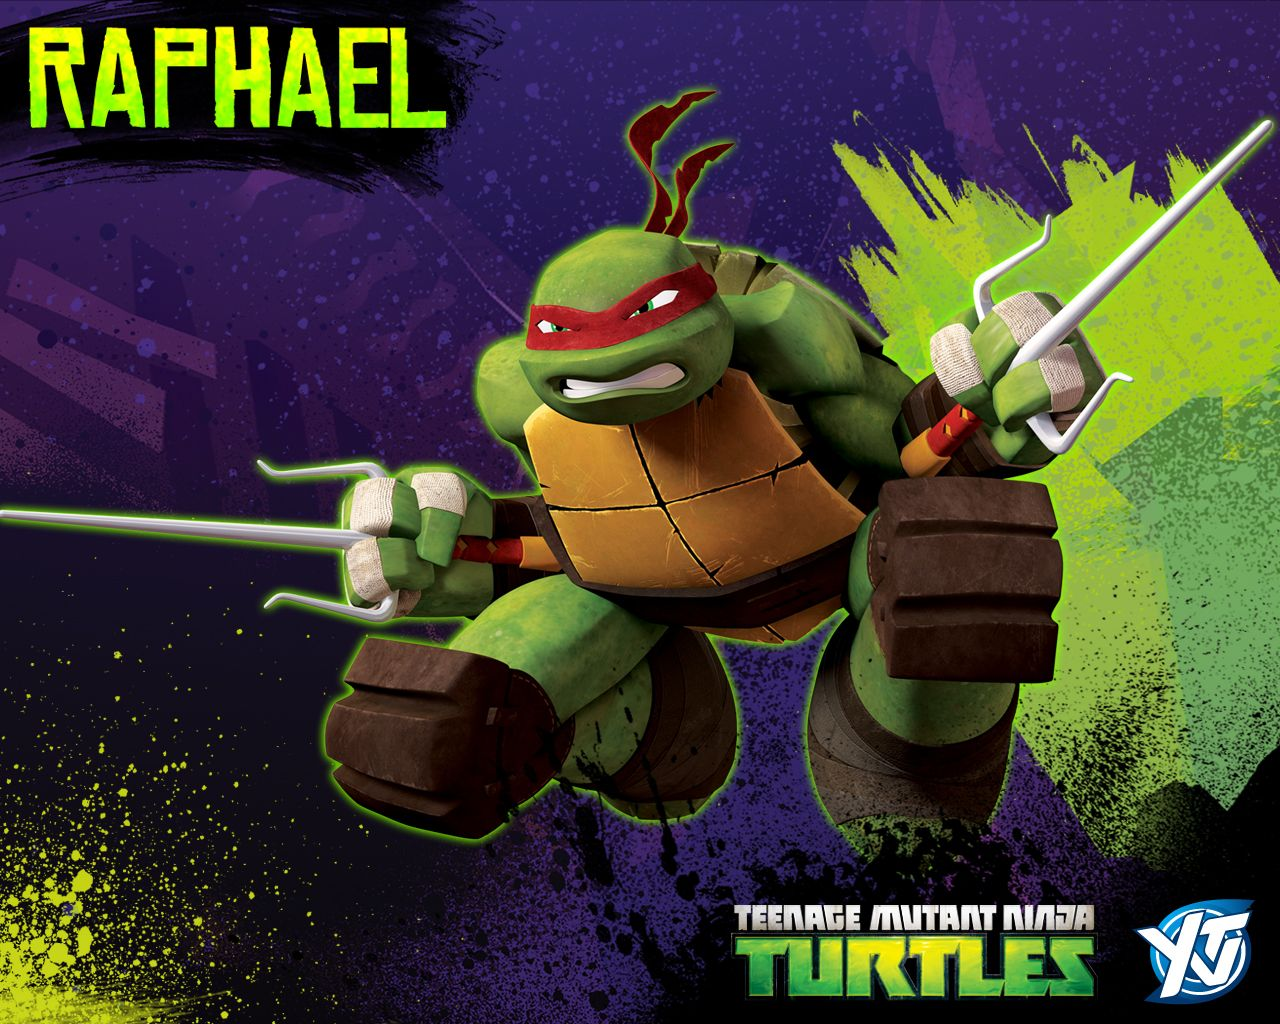 Wallpaper Do Raphael Turtle Wallpaper Teenage Ninja Turtles Teenage Mutant Ninja Turtles